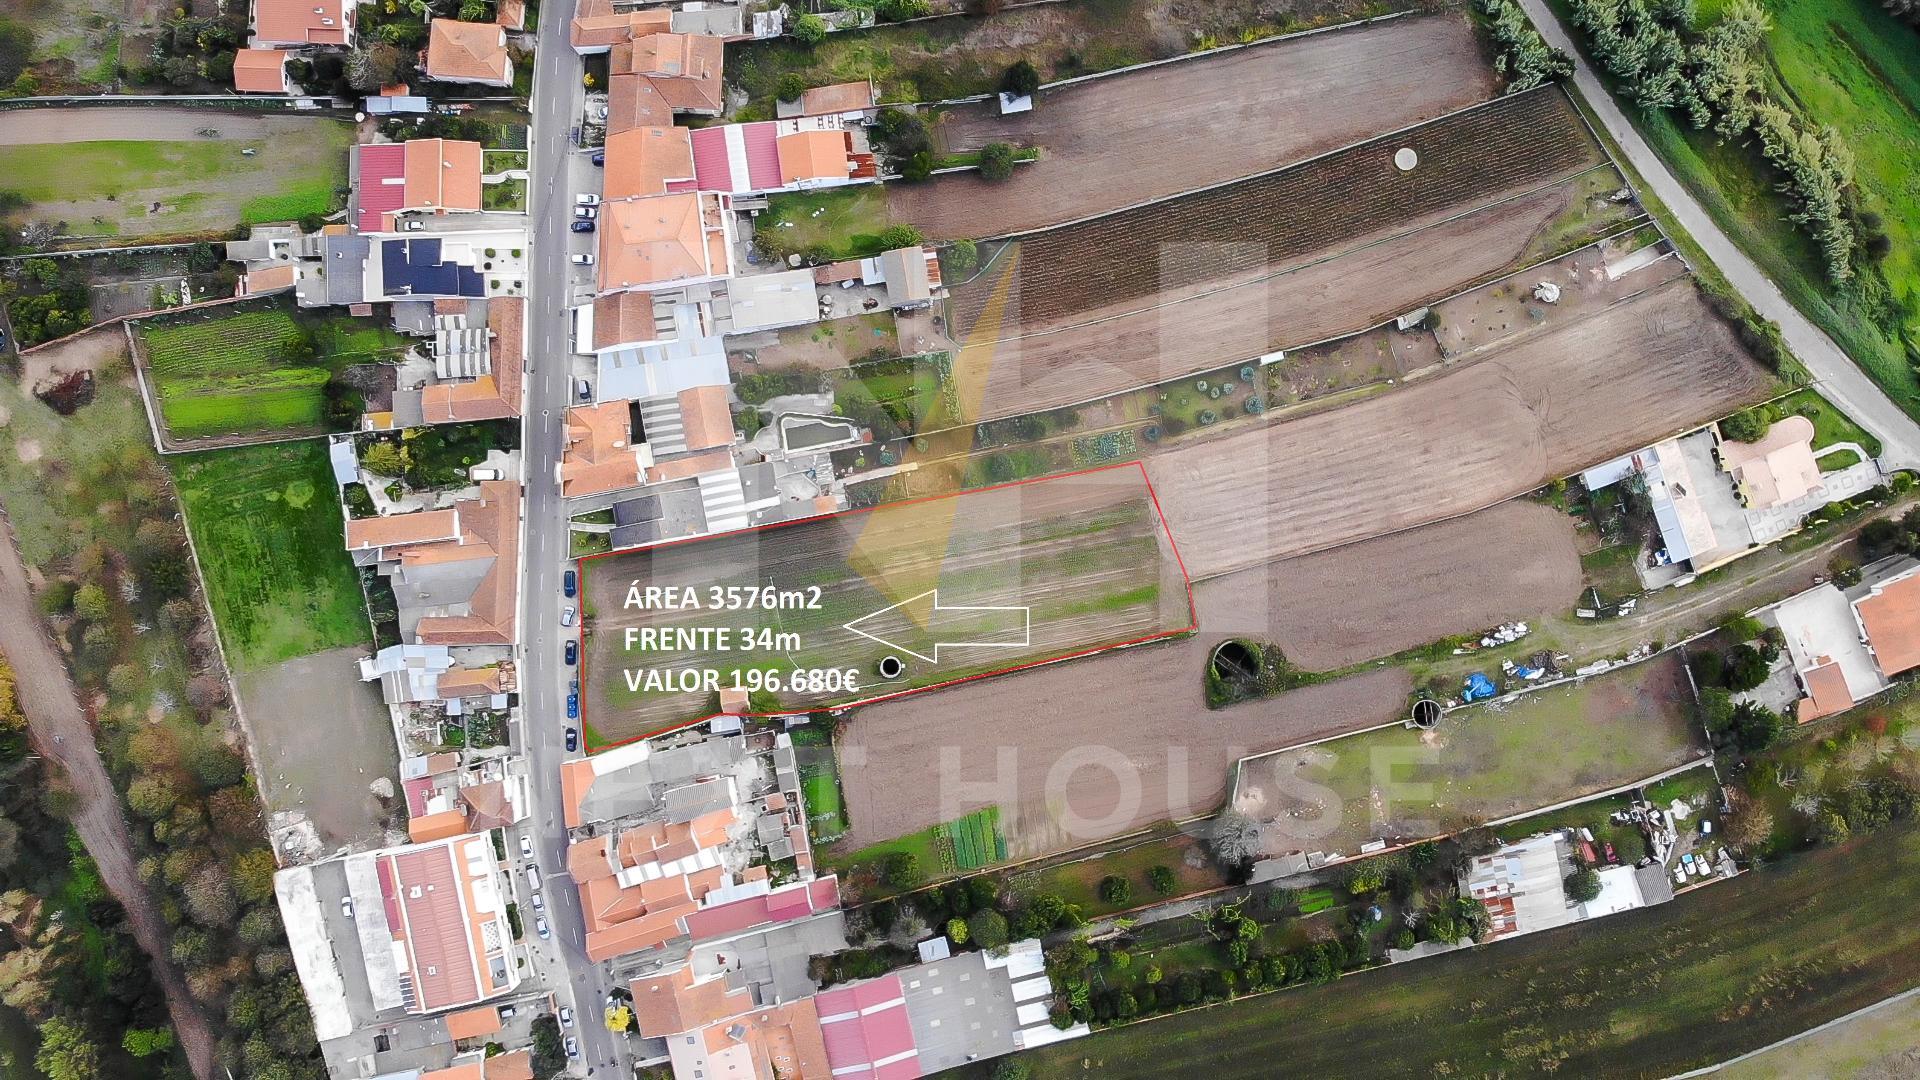 Terreno 5min Centro Aveiro, 34m fr  - Aveiro, Aradas